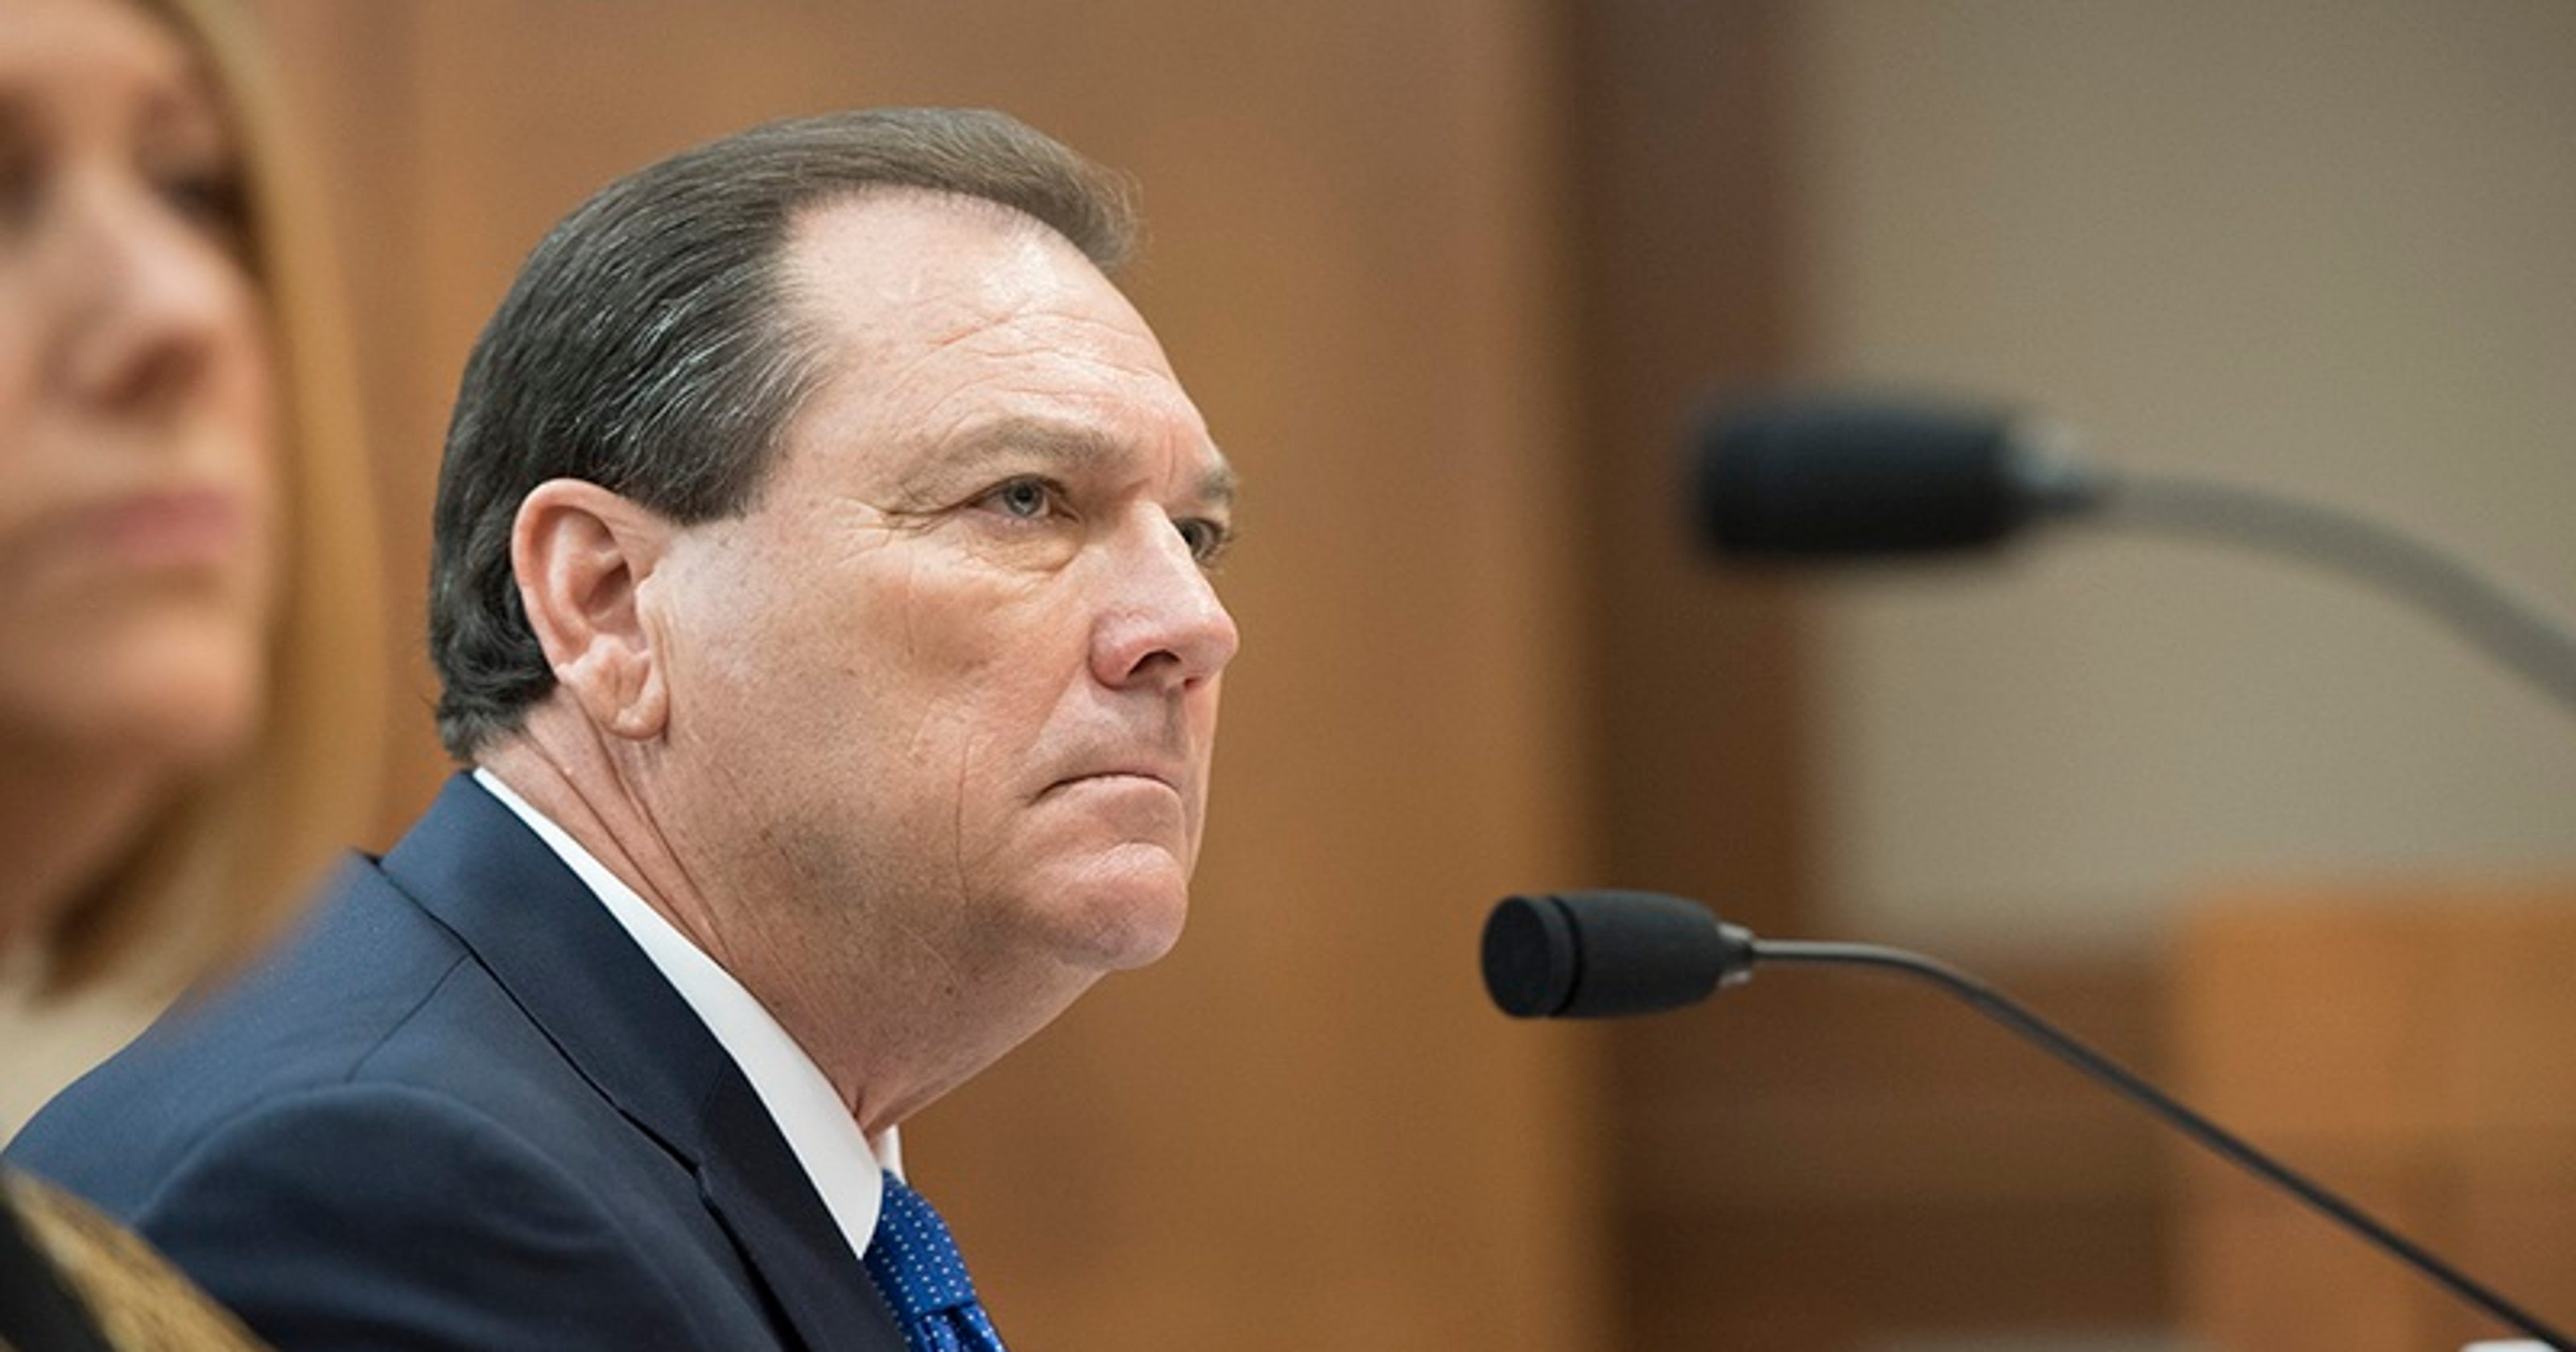 Report: Texas' CPS workers overloaded, urges overhaul